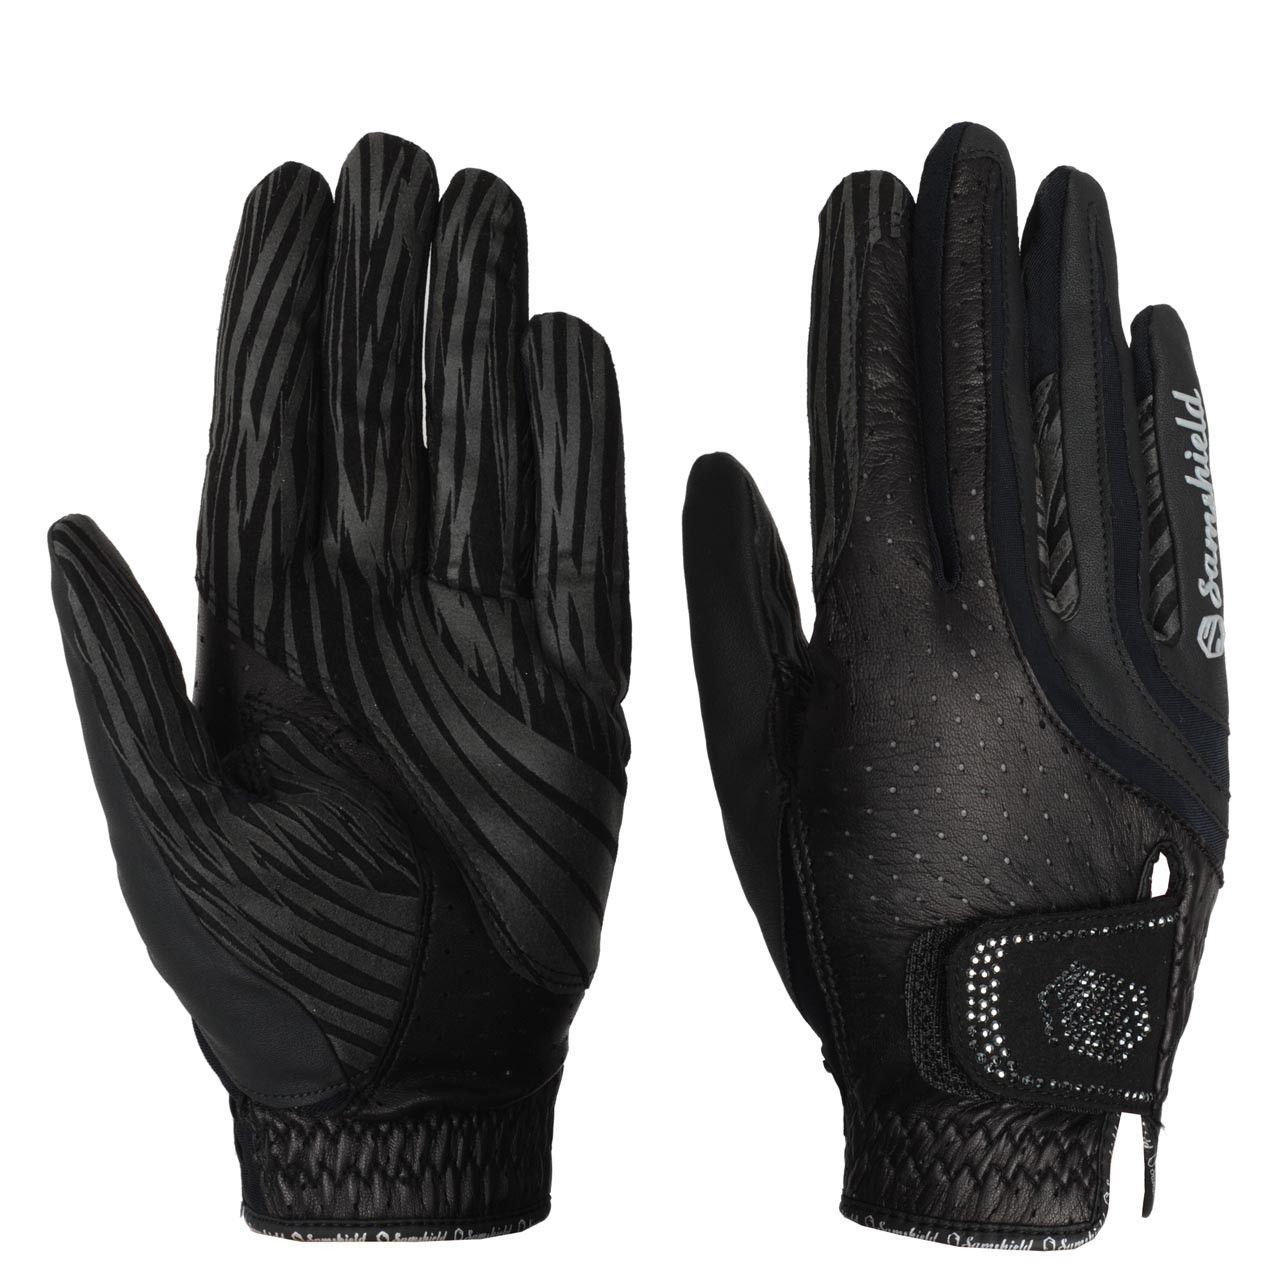 Samshield handschoenen Swarovski zwart maat:7,5